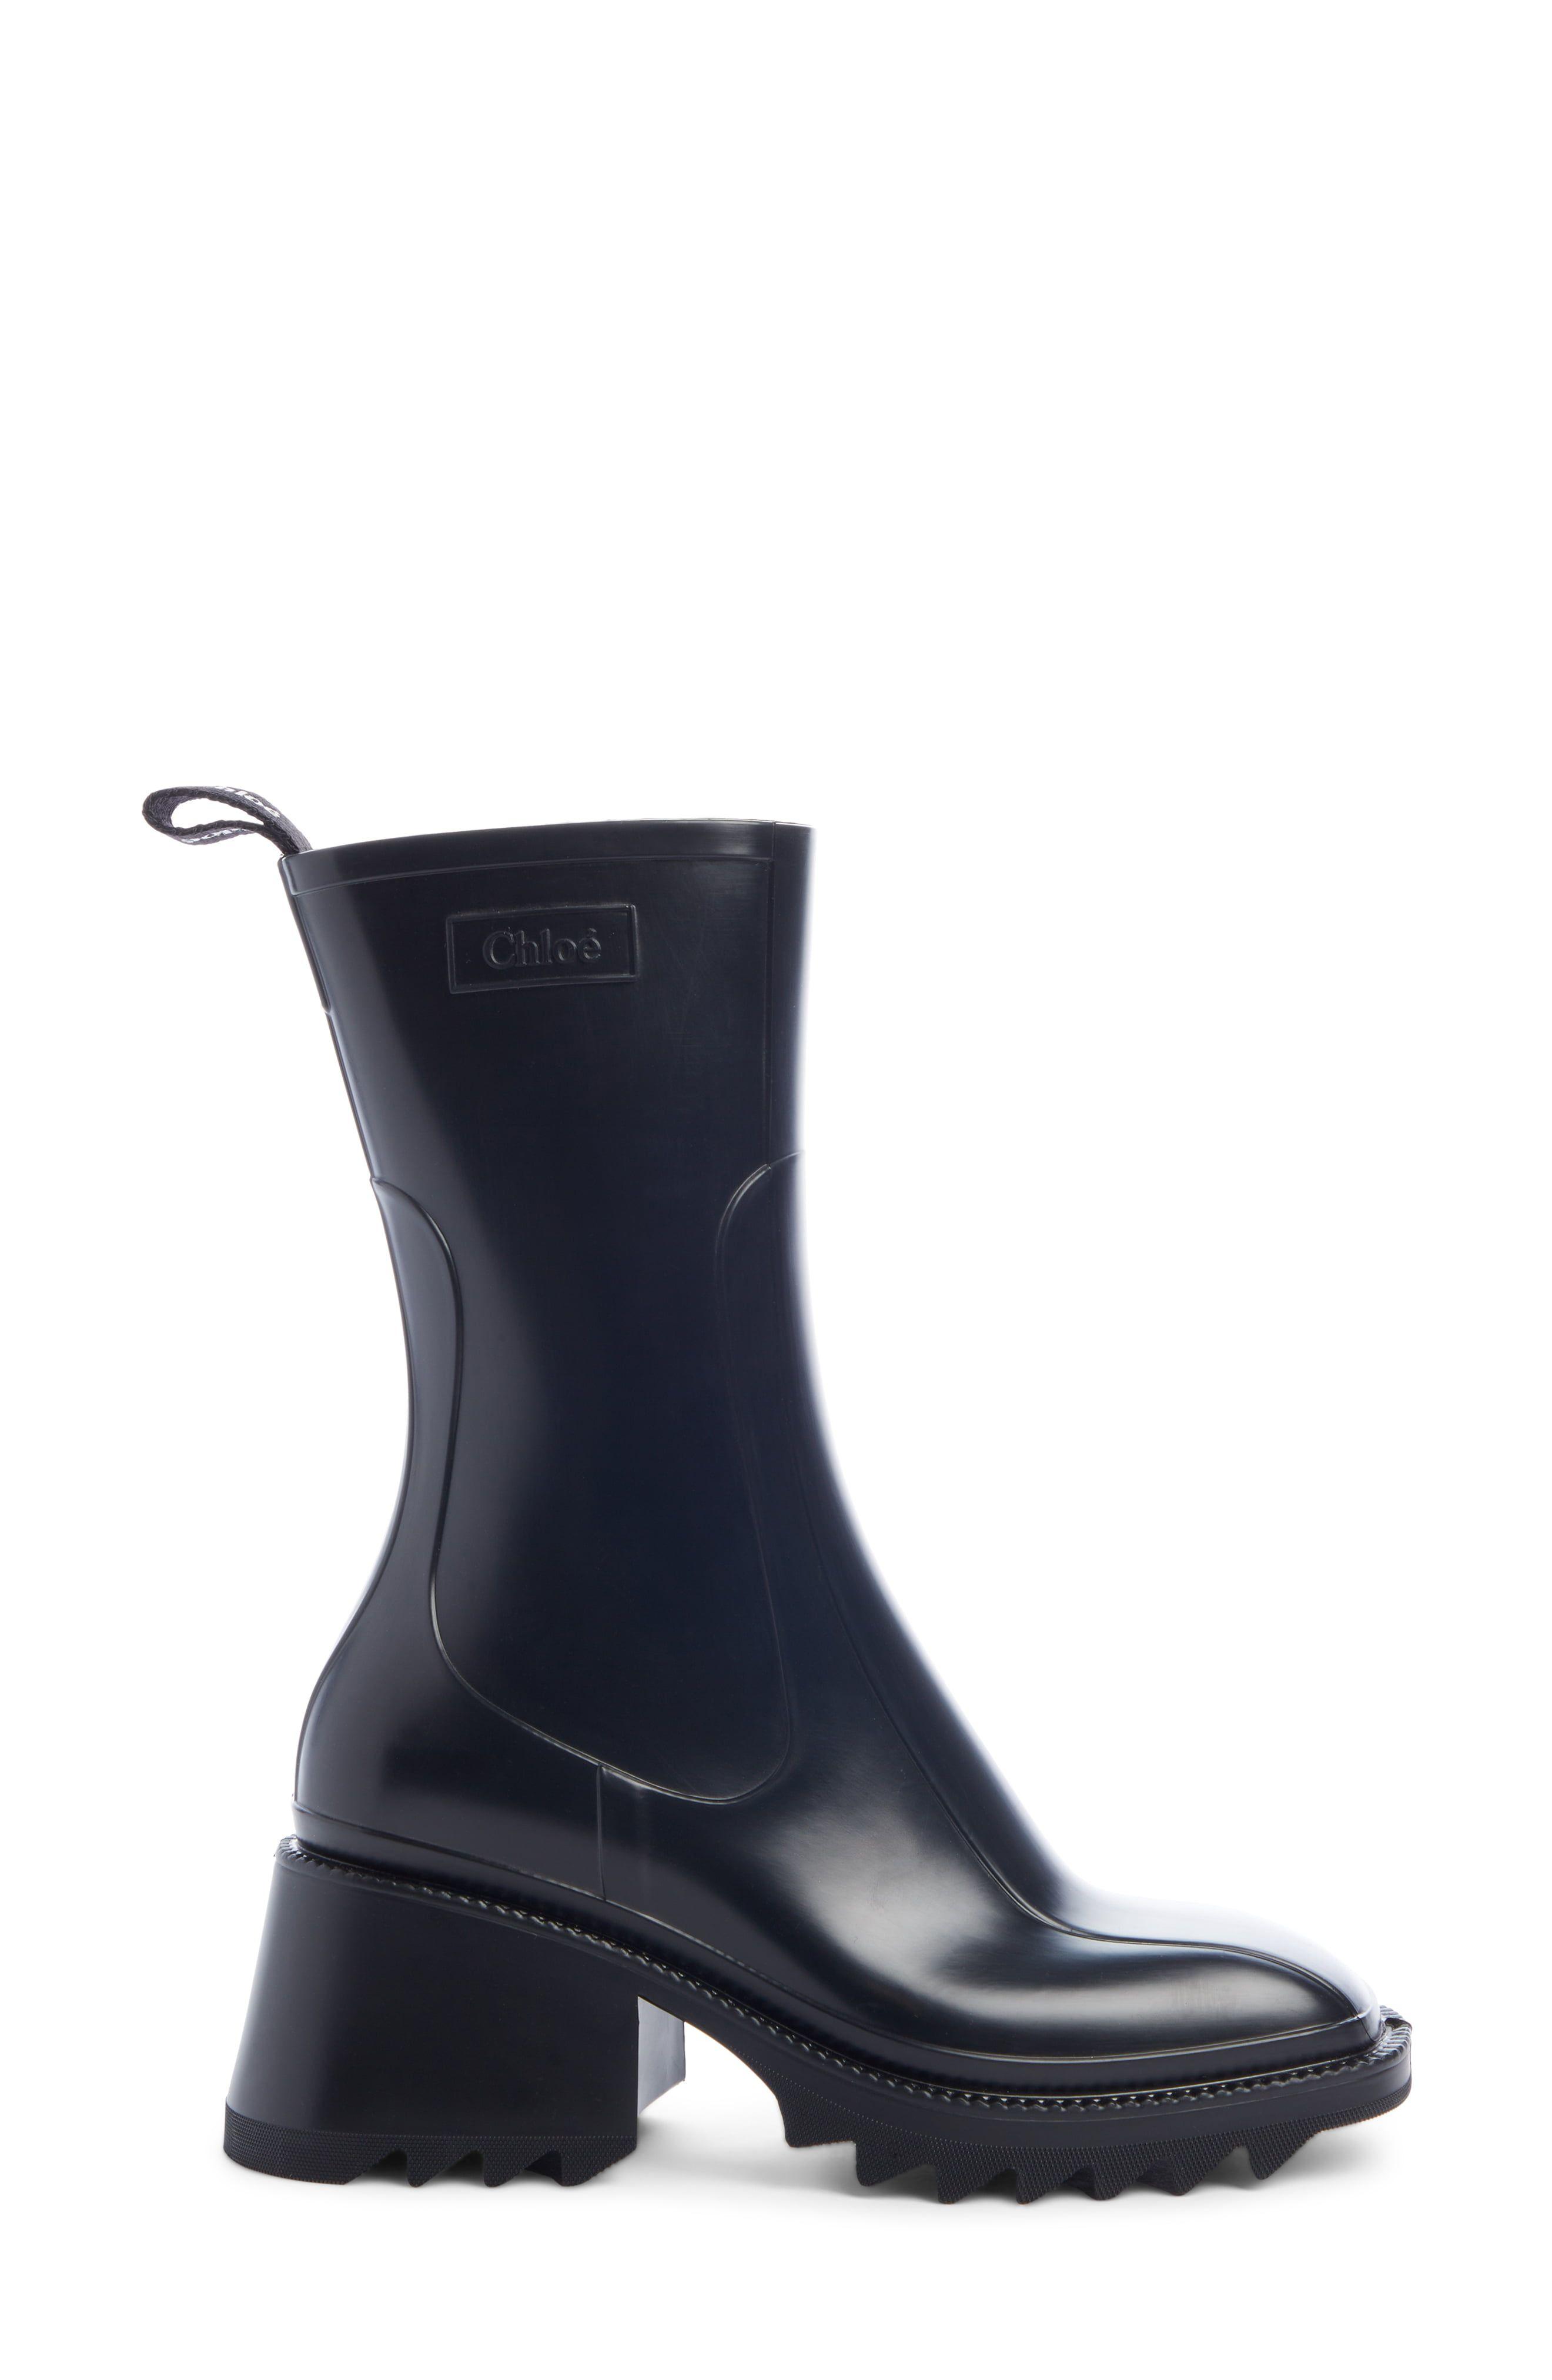 The PVC Betty Boot